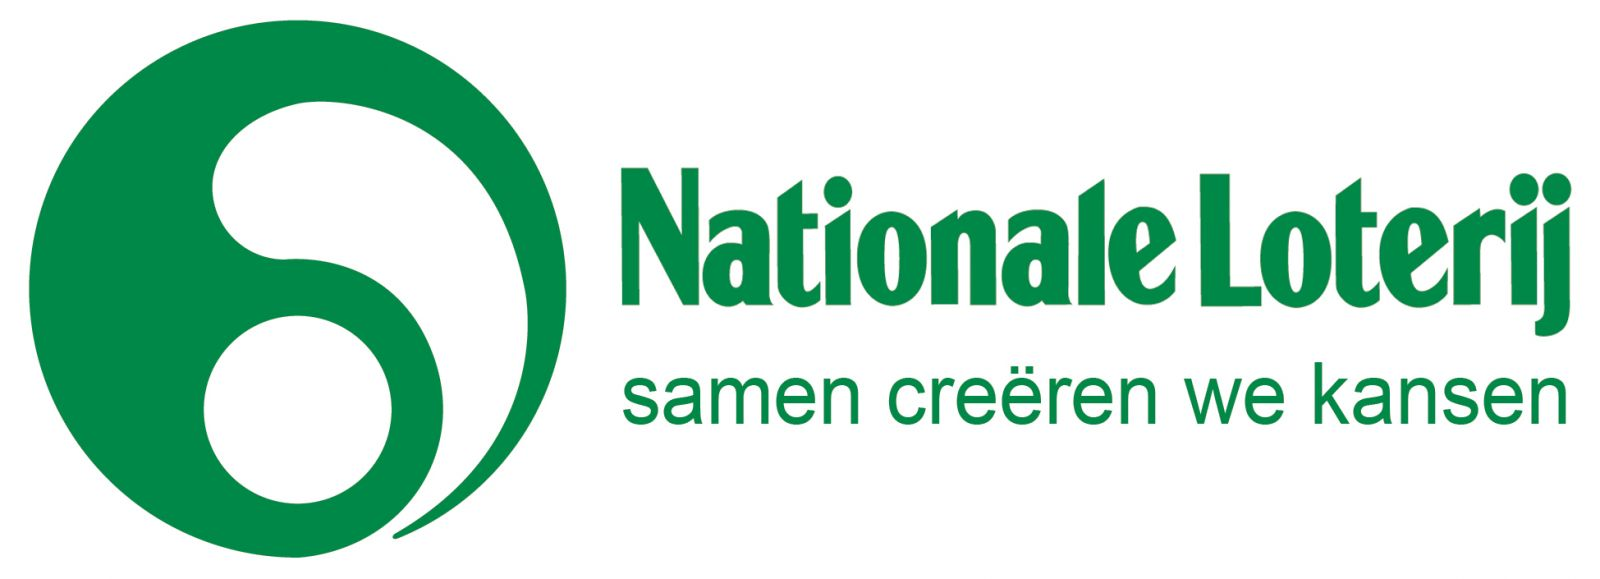 http://www.buitenlandseloterijen.com/wp-content/uploads/2015/10/logo-Nationale-Loterij.jpg